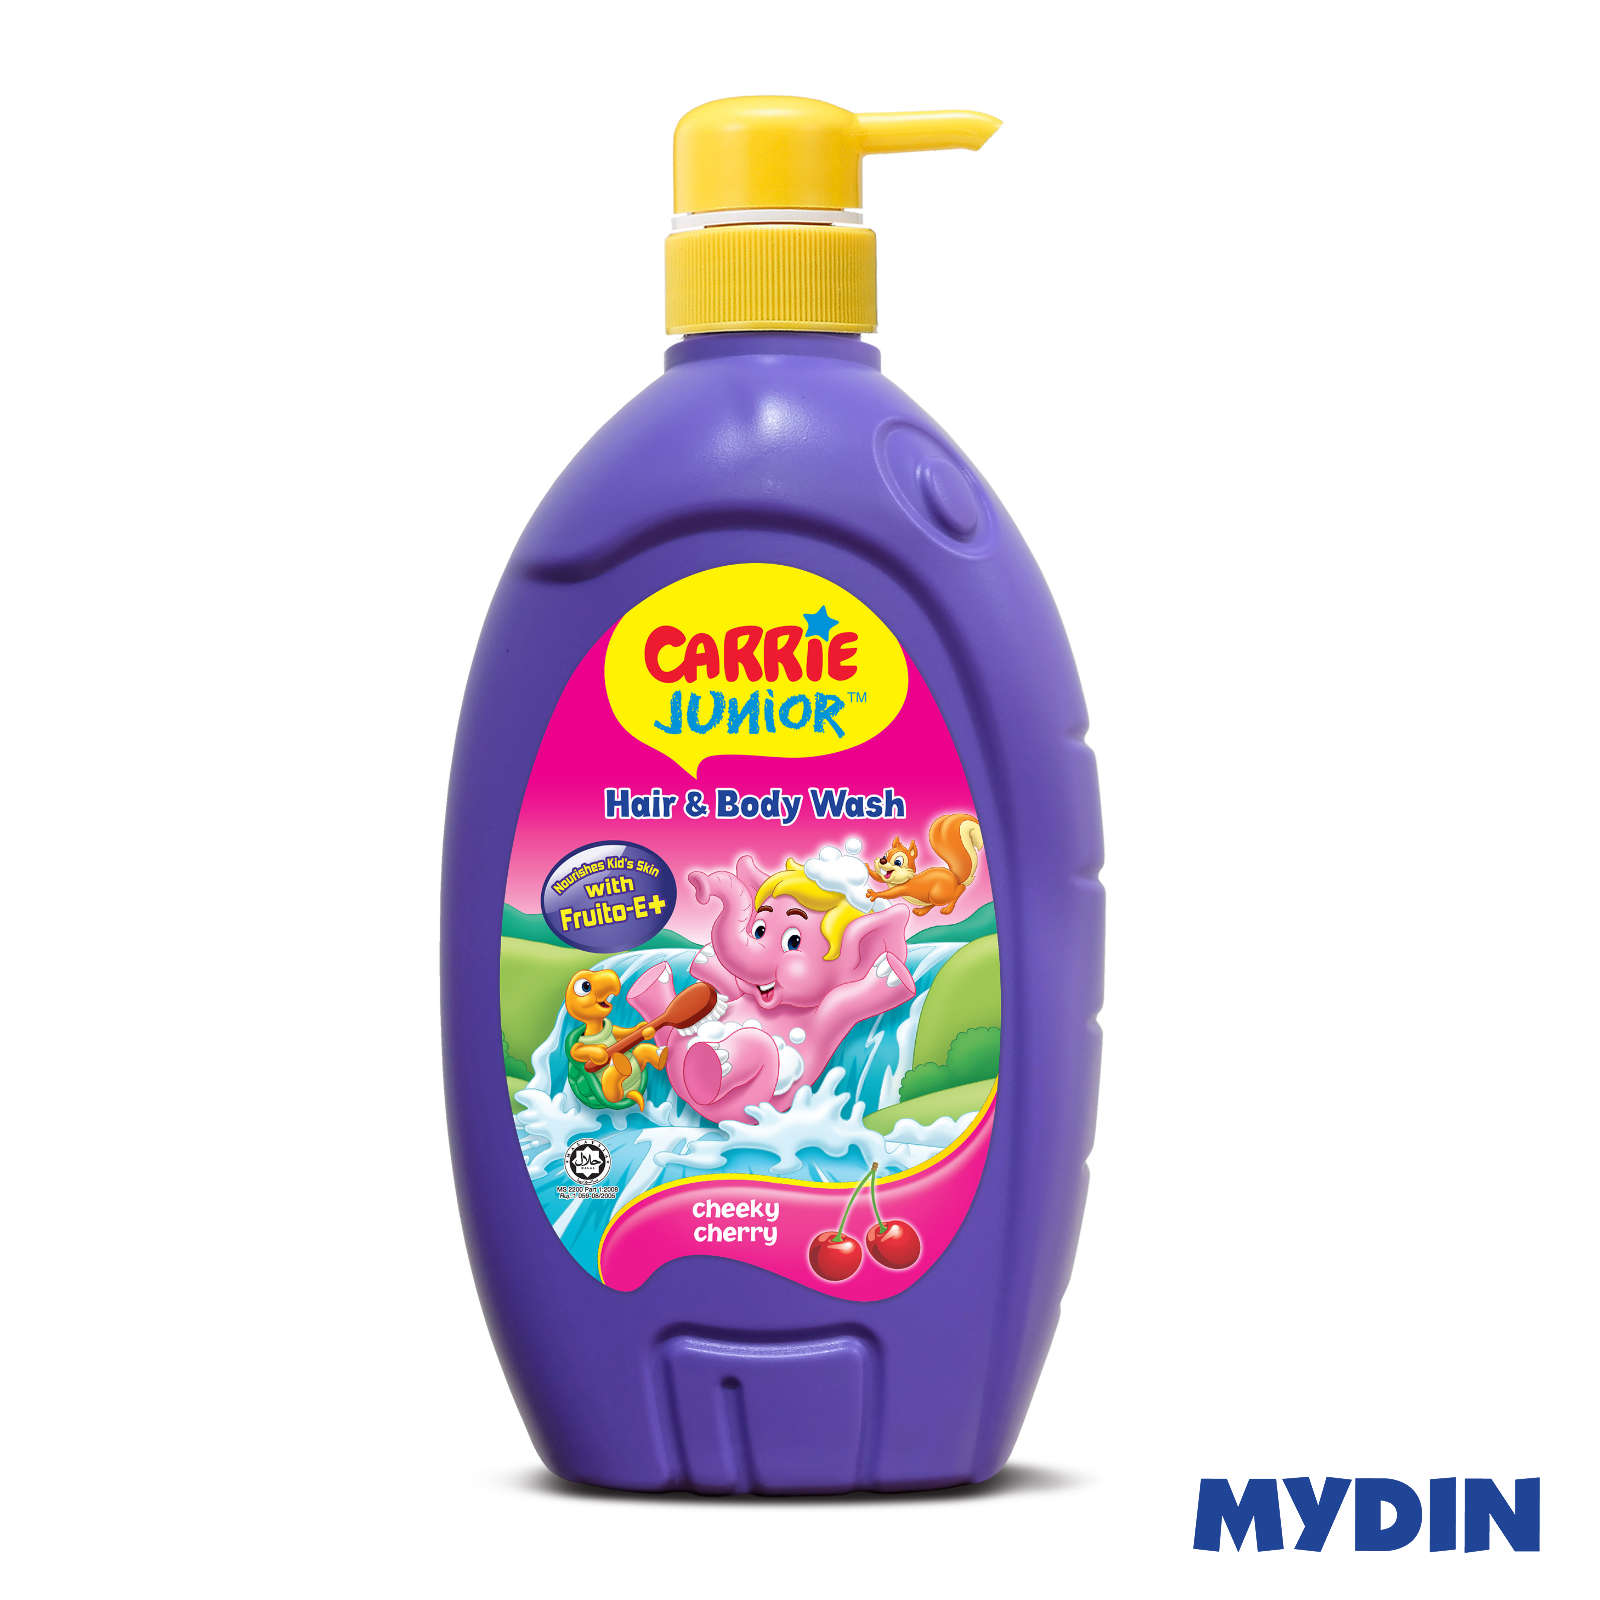 Carrie Junior Baby Hair & Body Wash - Cheeky Cherry (700ml)